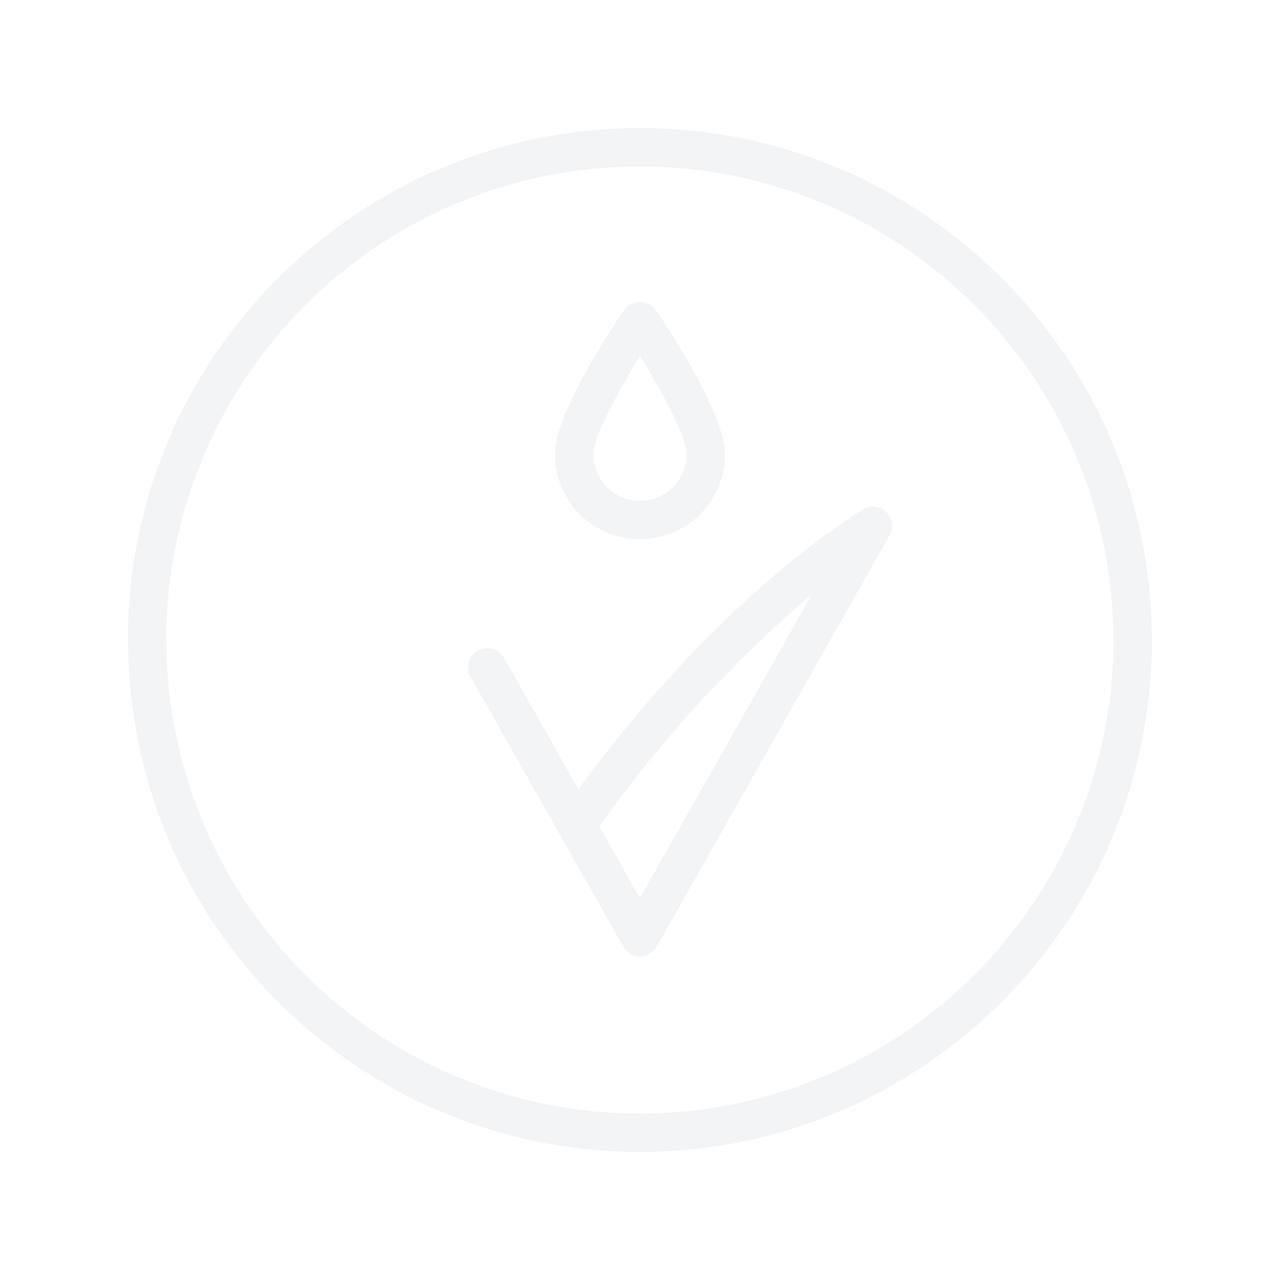 BIOKAP Nutricolor 7.4 Auburn Blond Permanent Hair Dye 140ml